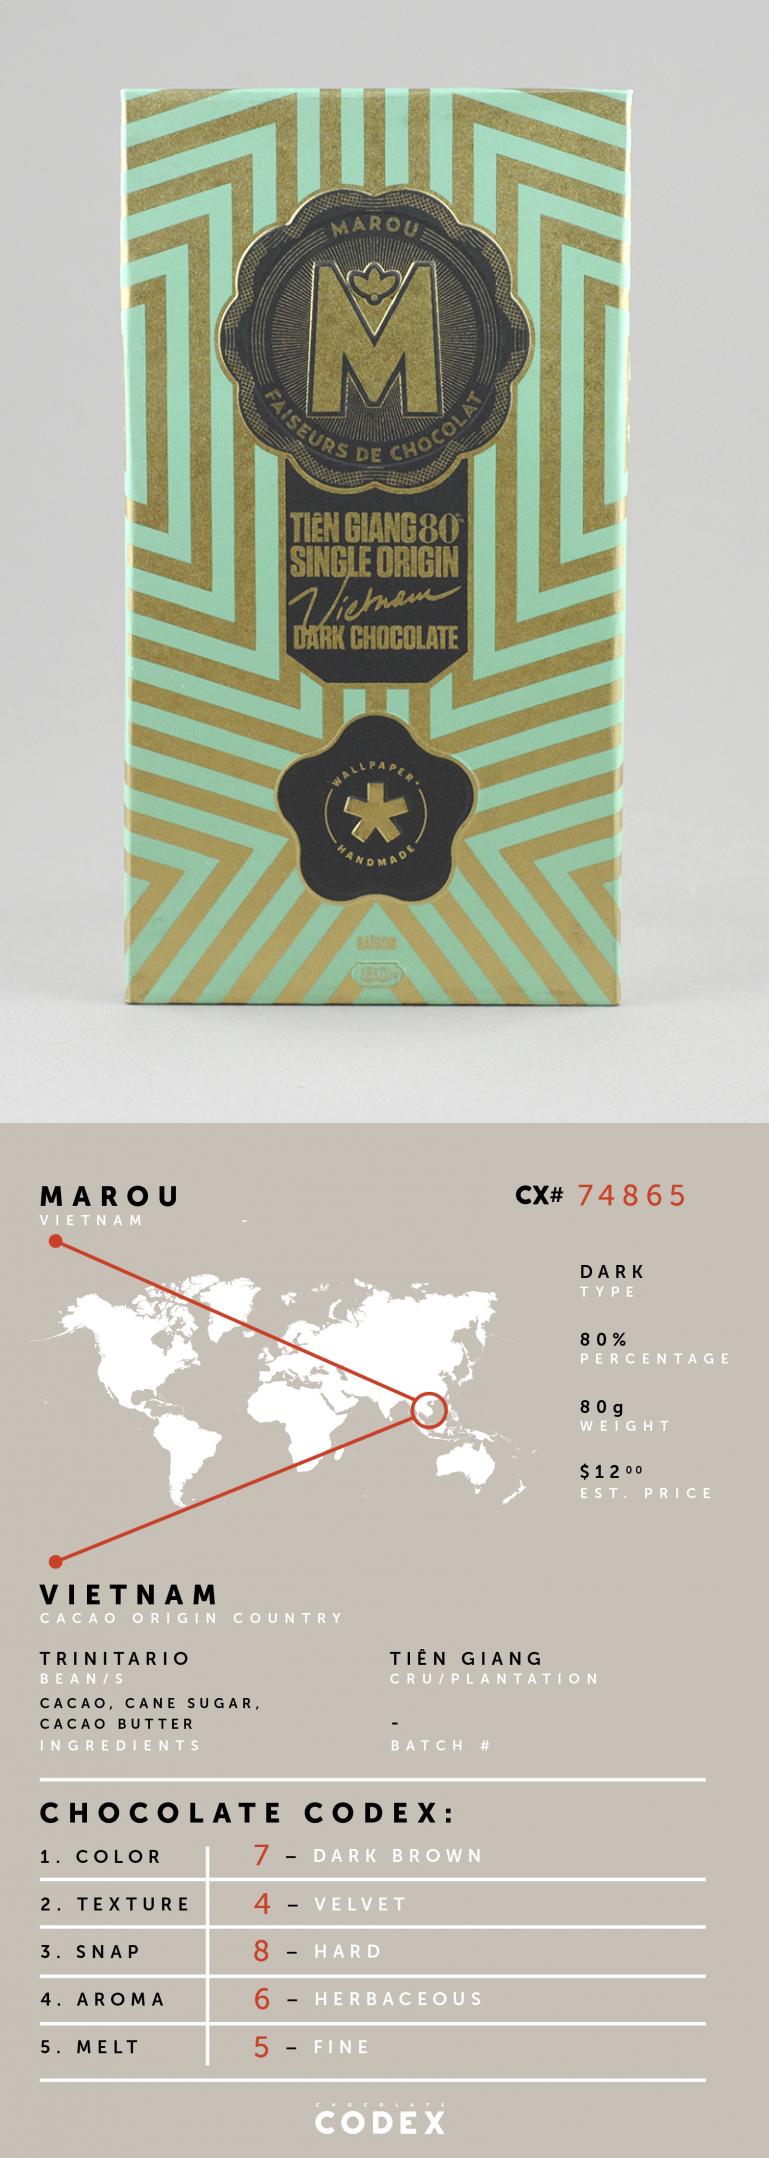 ChocolateCodex_Marou_Tien_Giang_80